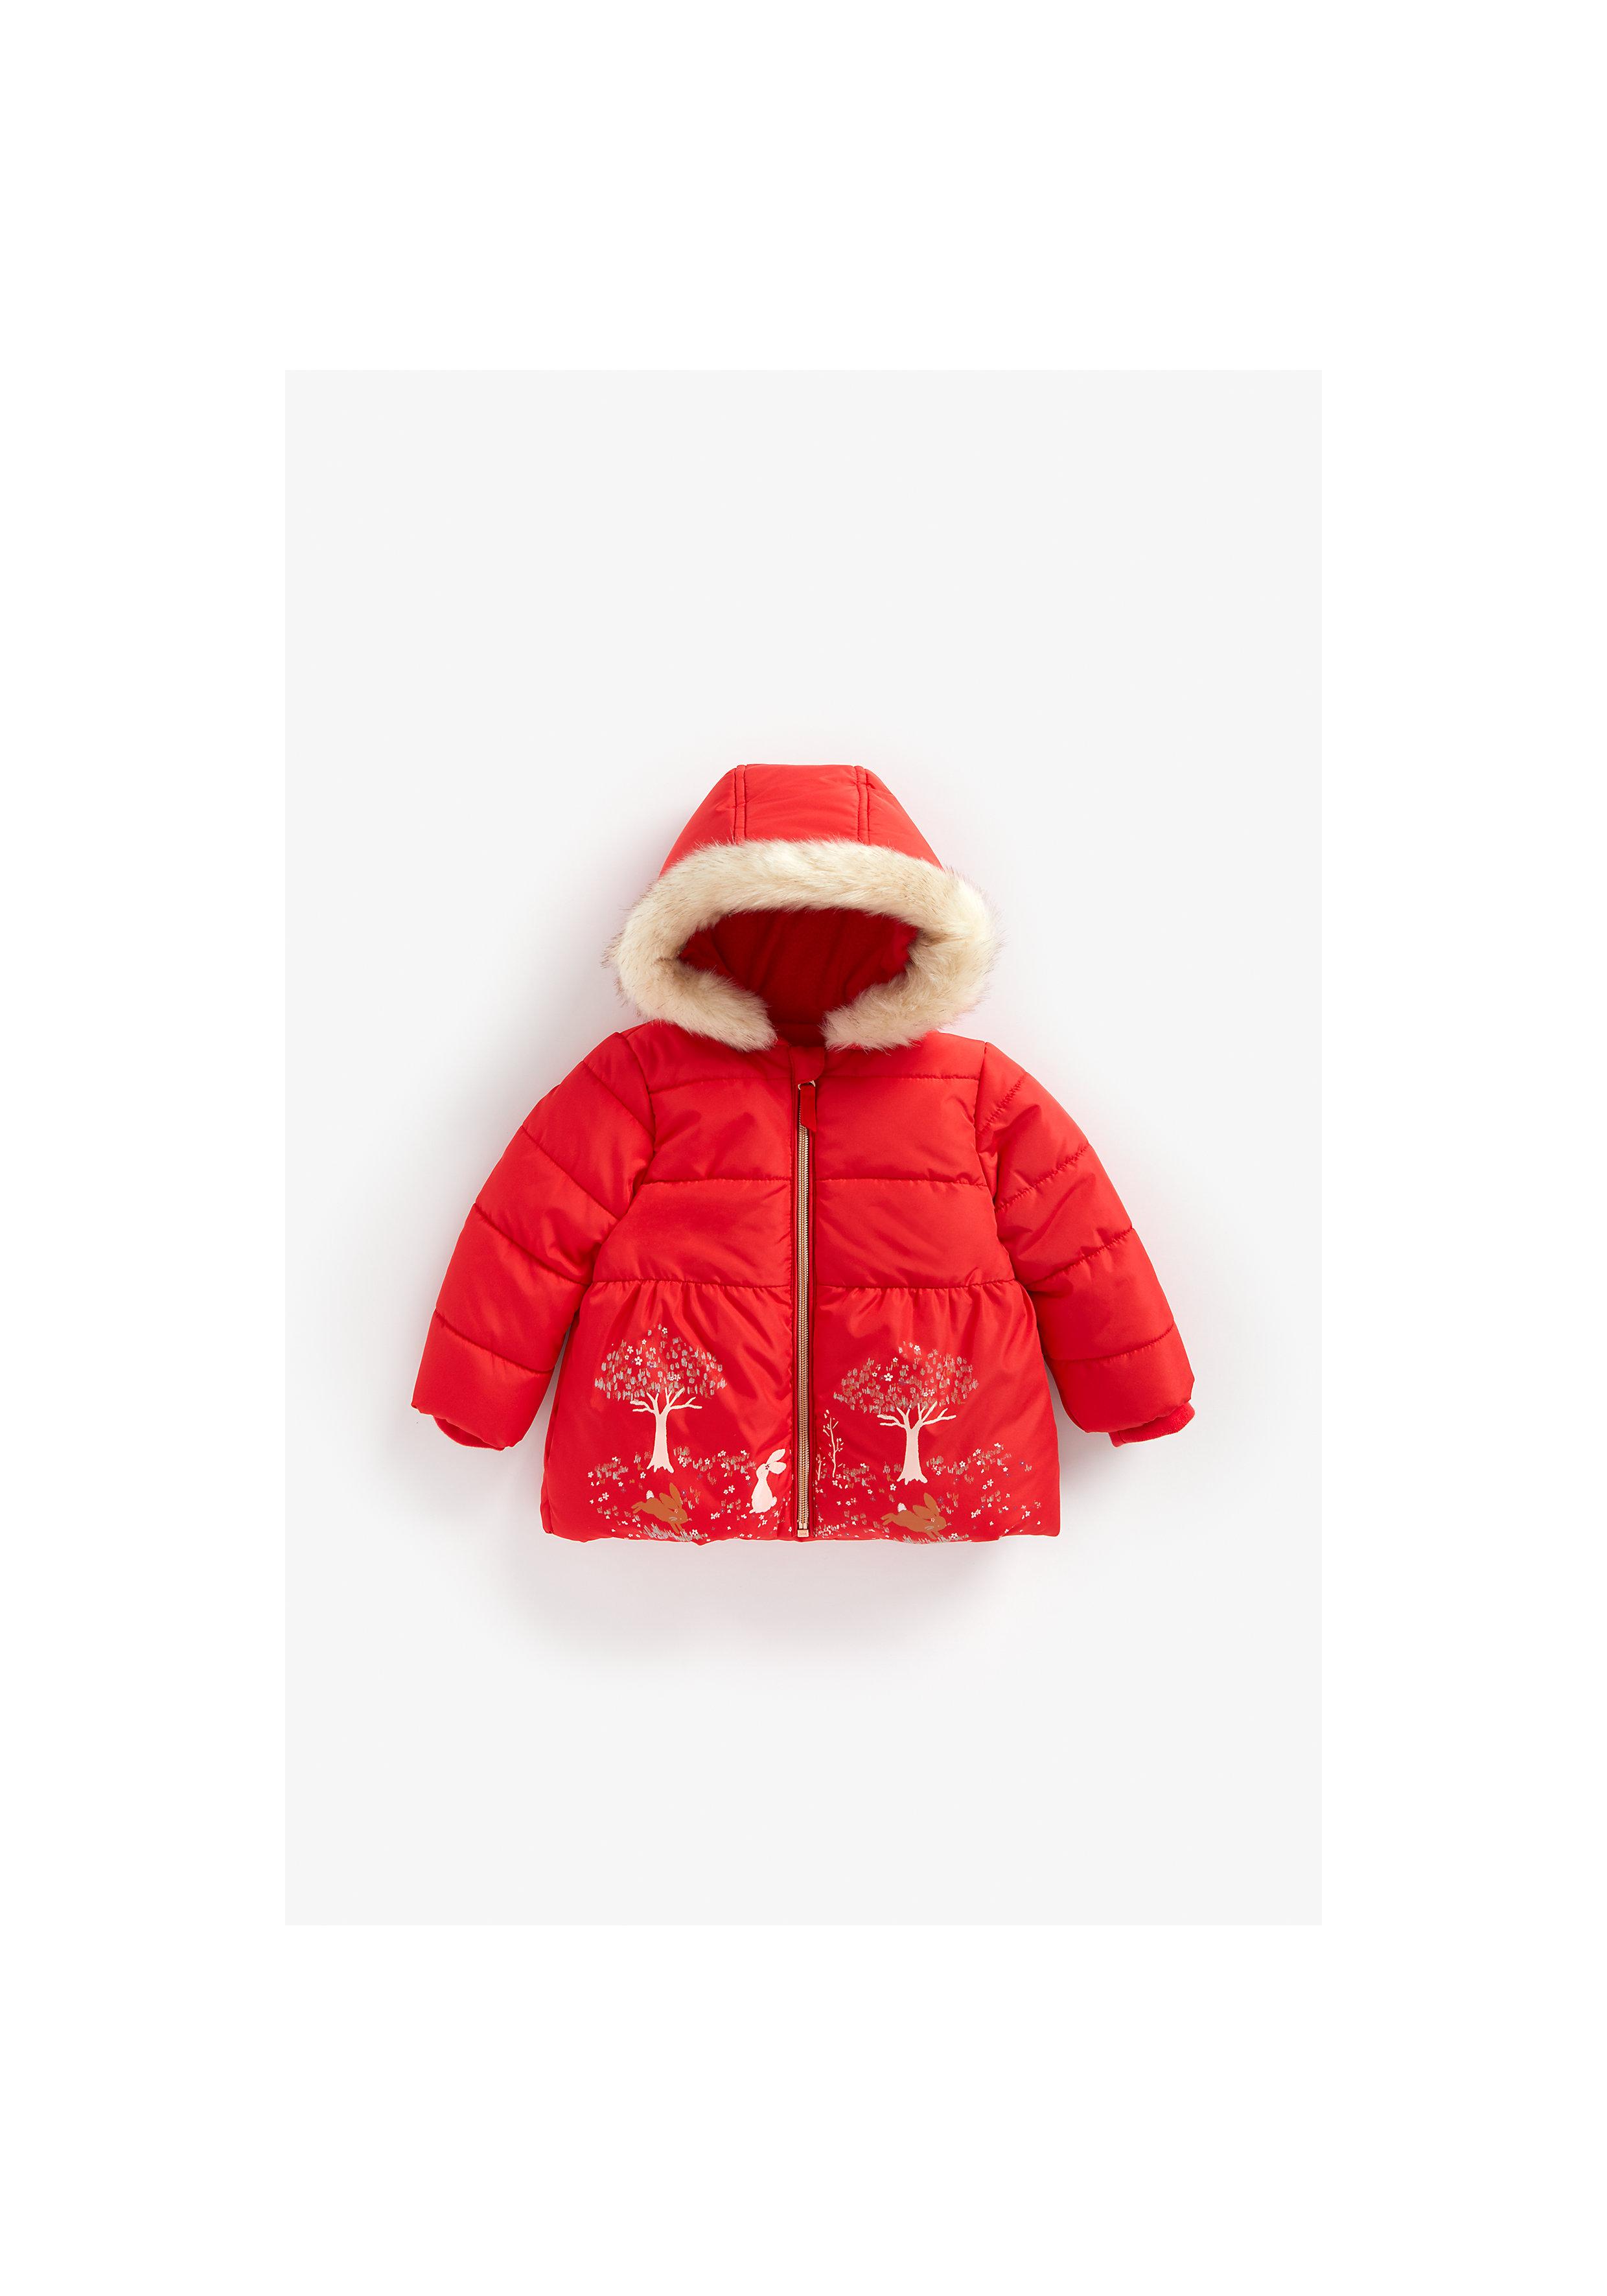 Mothercare | Girls Full Sleeves Jacket Border Print - Red